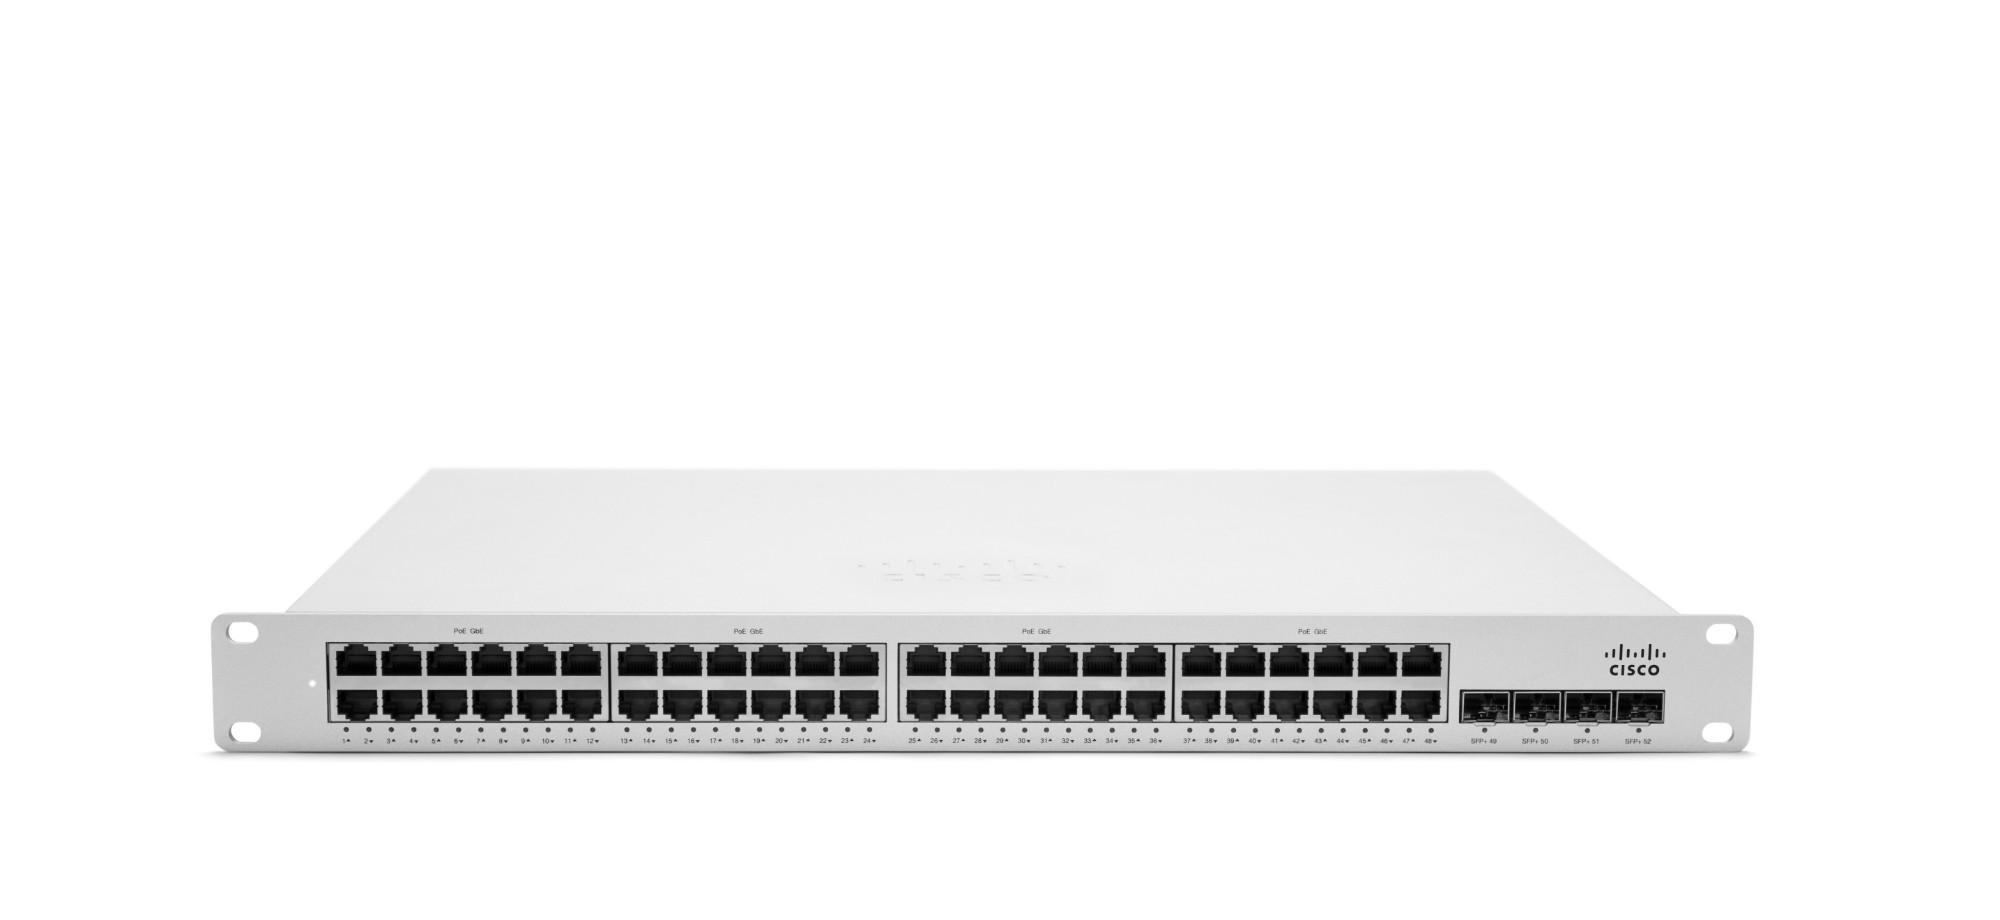 Cisco MS350-48LP Gestionado L3 Gigabit Ethernet (10/100/1000) Gris 1U Energía sobre Ethernet (PoE)